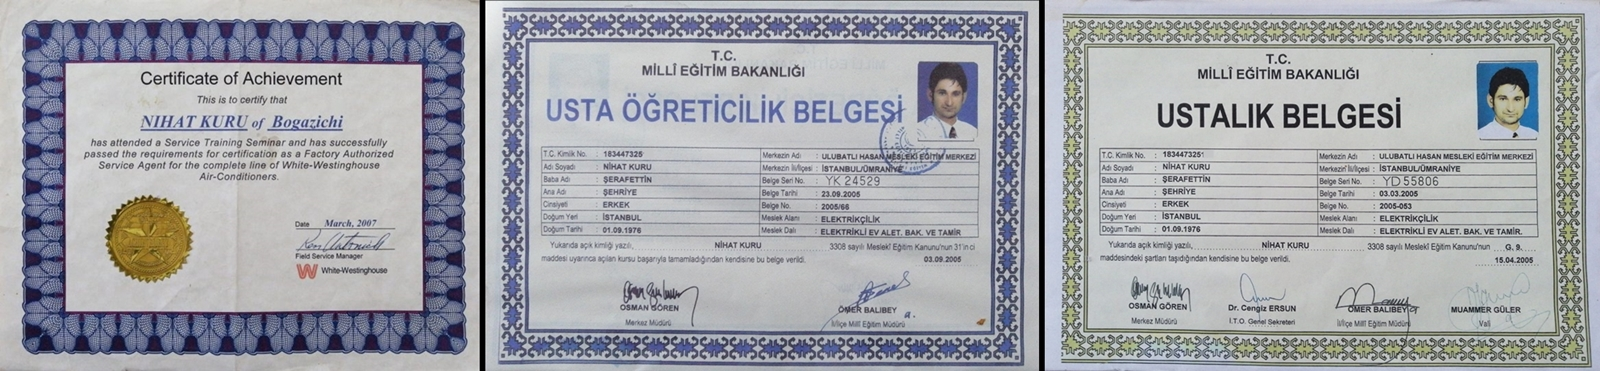 Bakırköy Whirlpool Servis